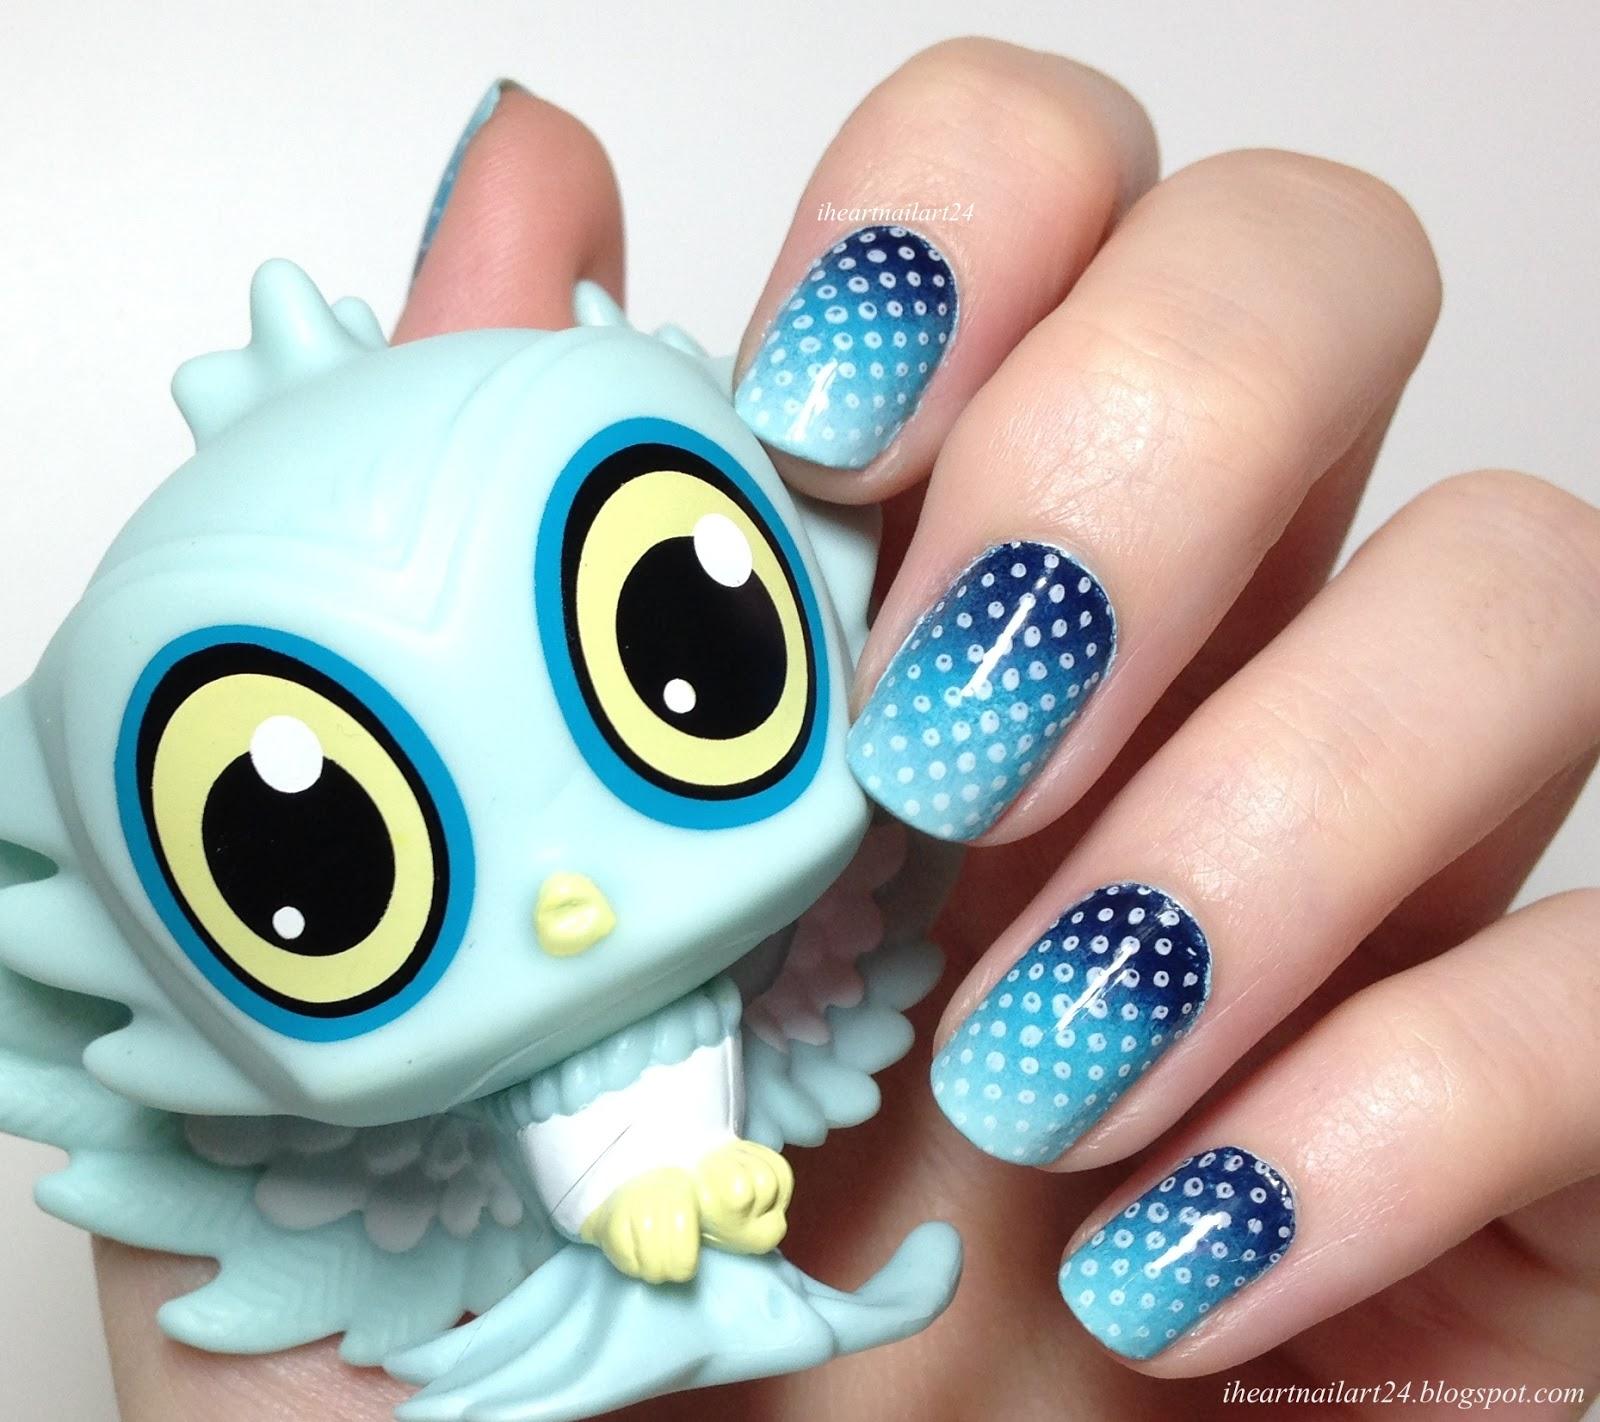 Blue Gradient Nail Art | I Heart Nail Art